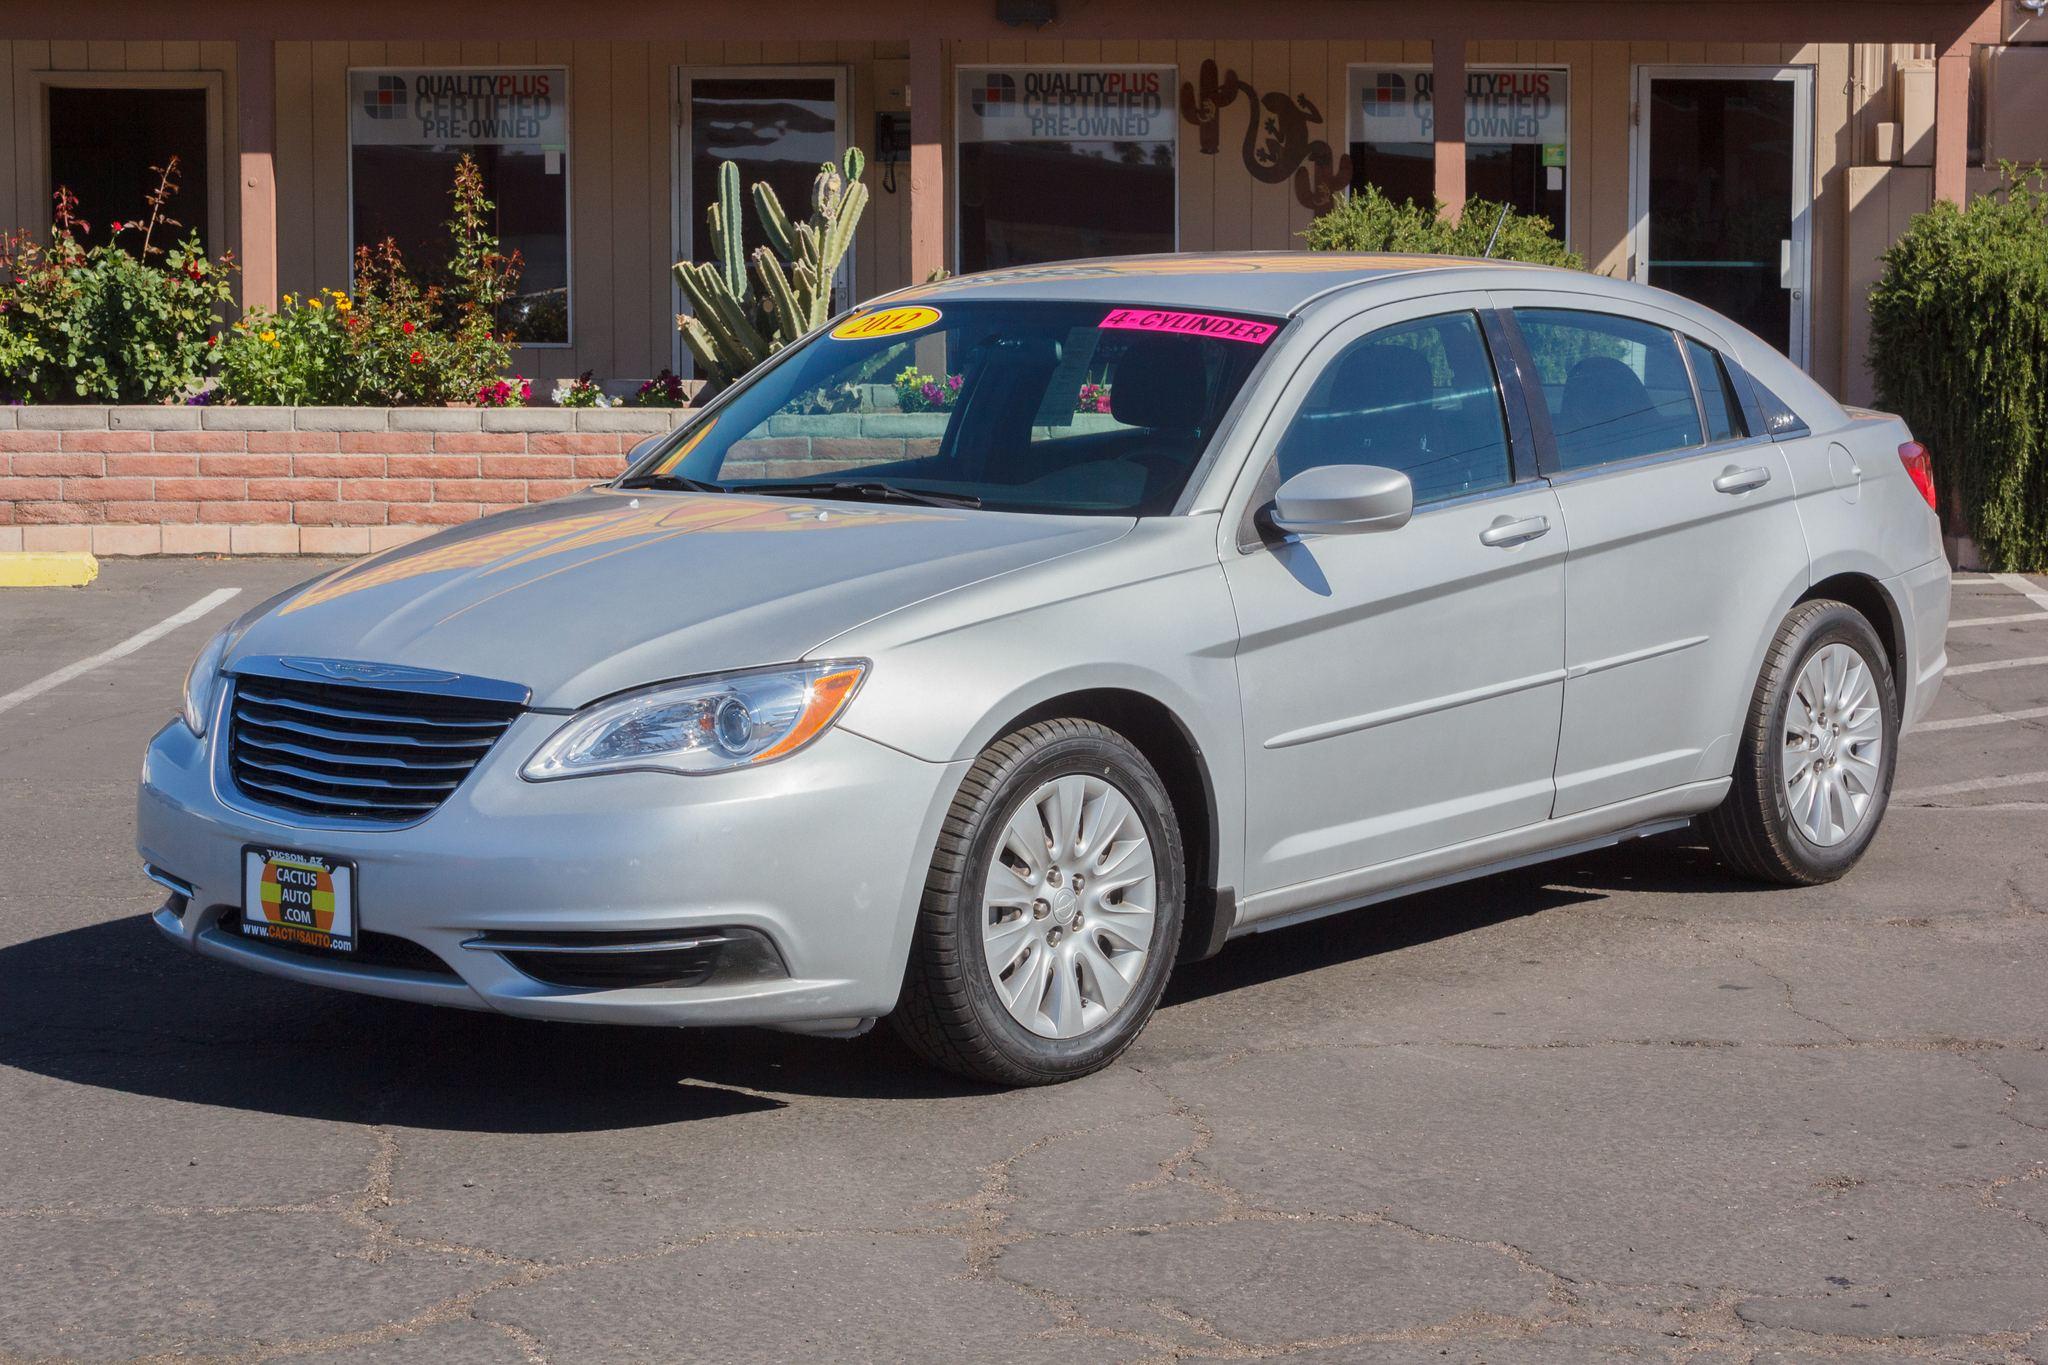 Photo of 2012 Chrysler 200 4d Sedan LX Bright Silver Metallic Clearcoat